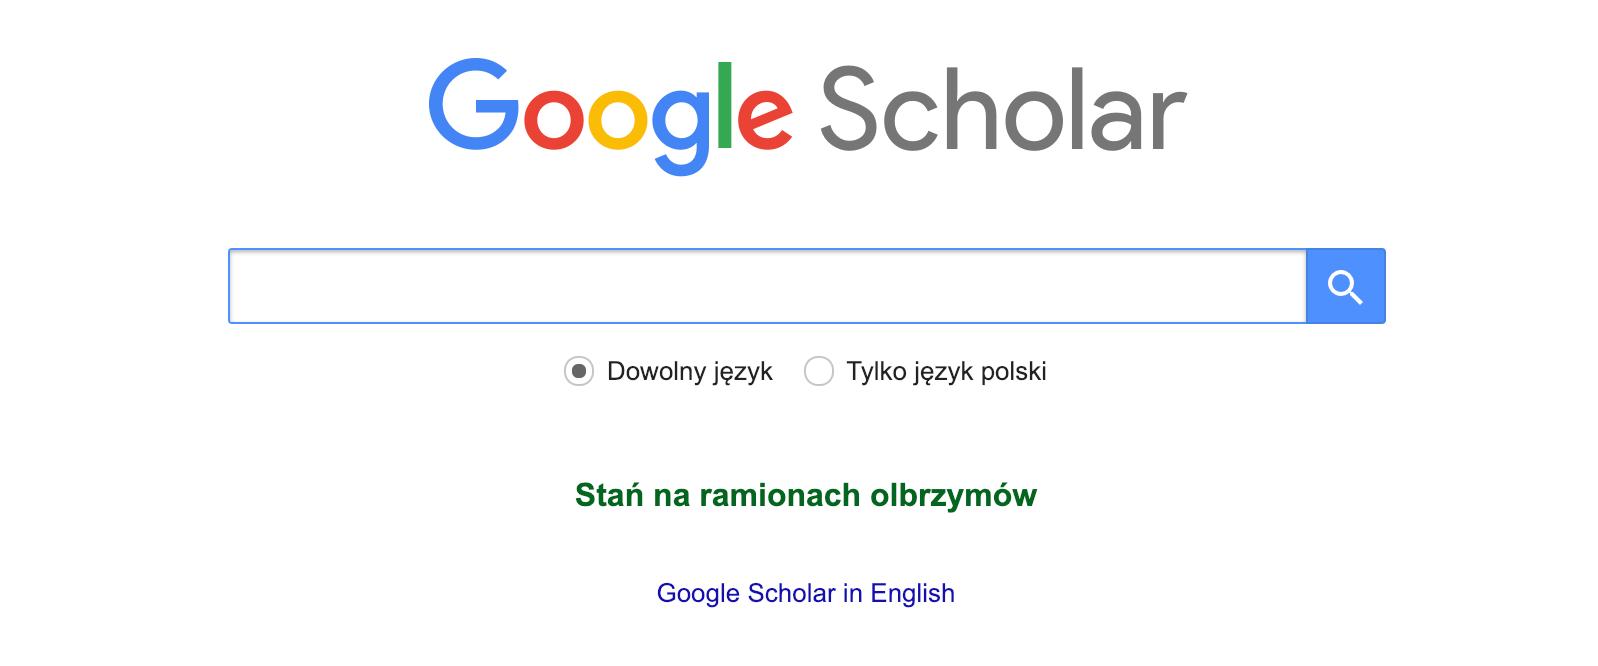 porady seo 2019 Google Scholar